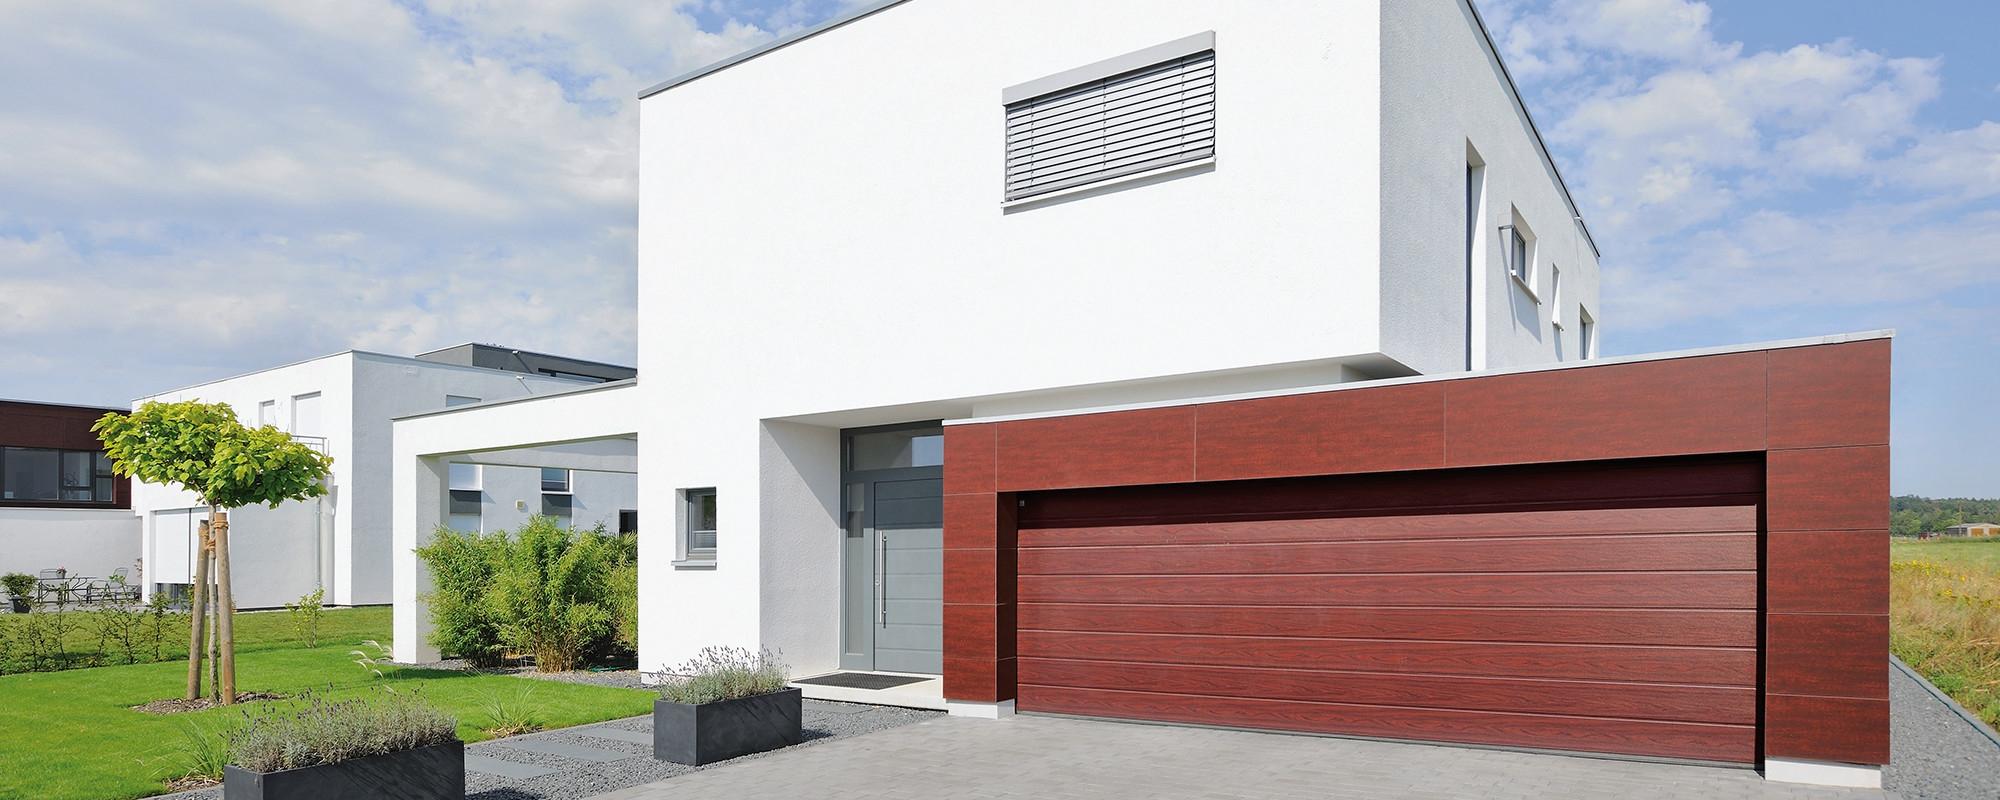 Hörmann Garagedeuren Oosterhout